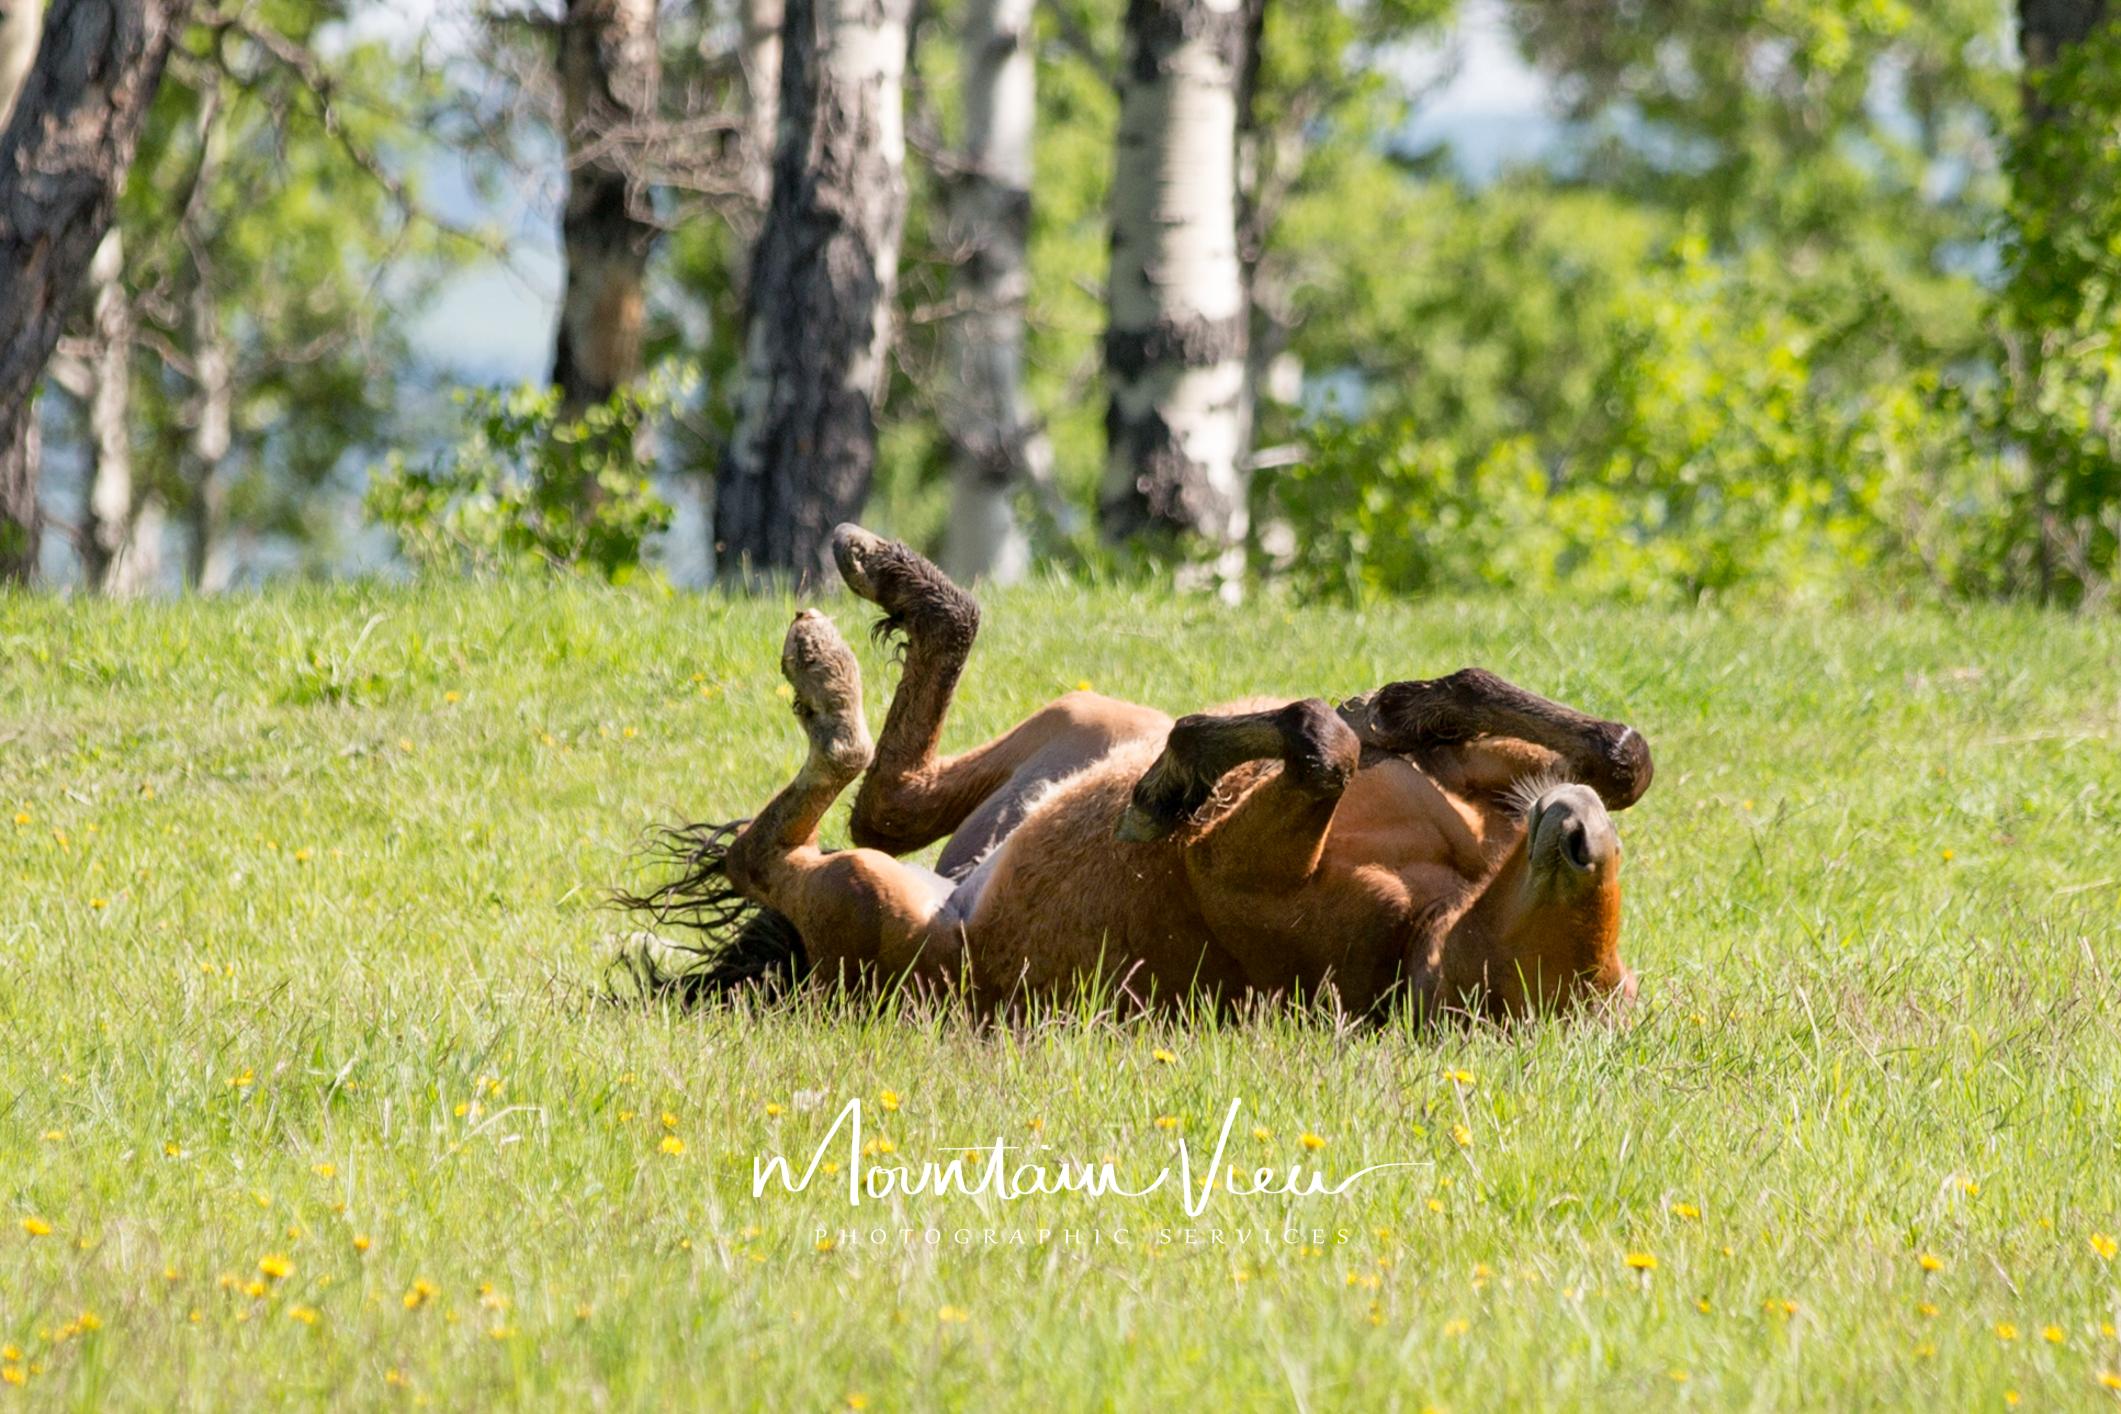 Wild Horse Tour June 8-30.jpg